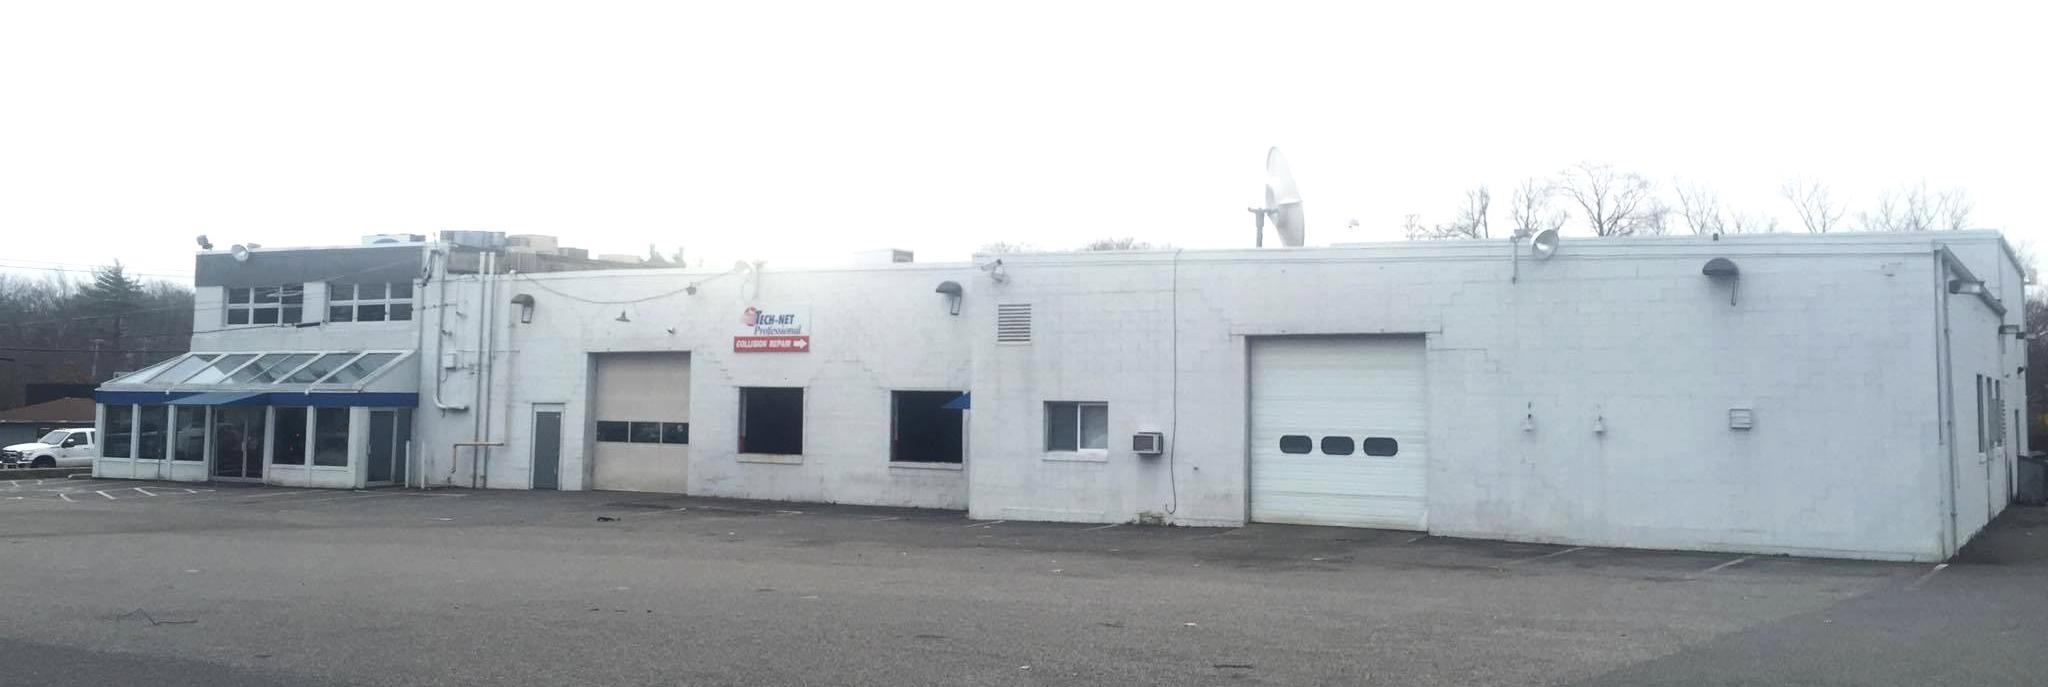 The original Ricky Smith Pontiac dealership pre-demolition